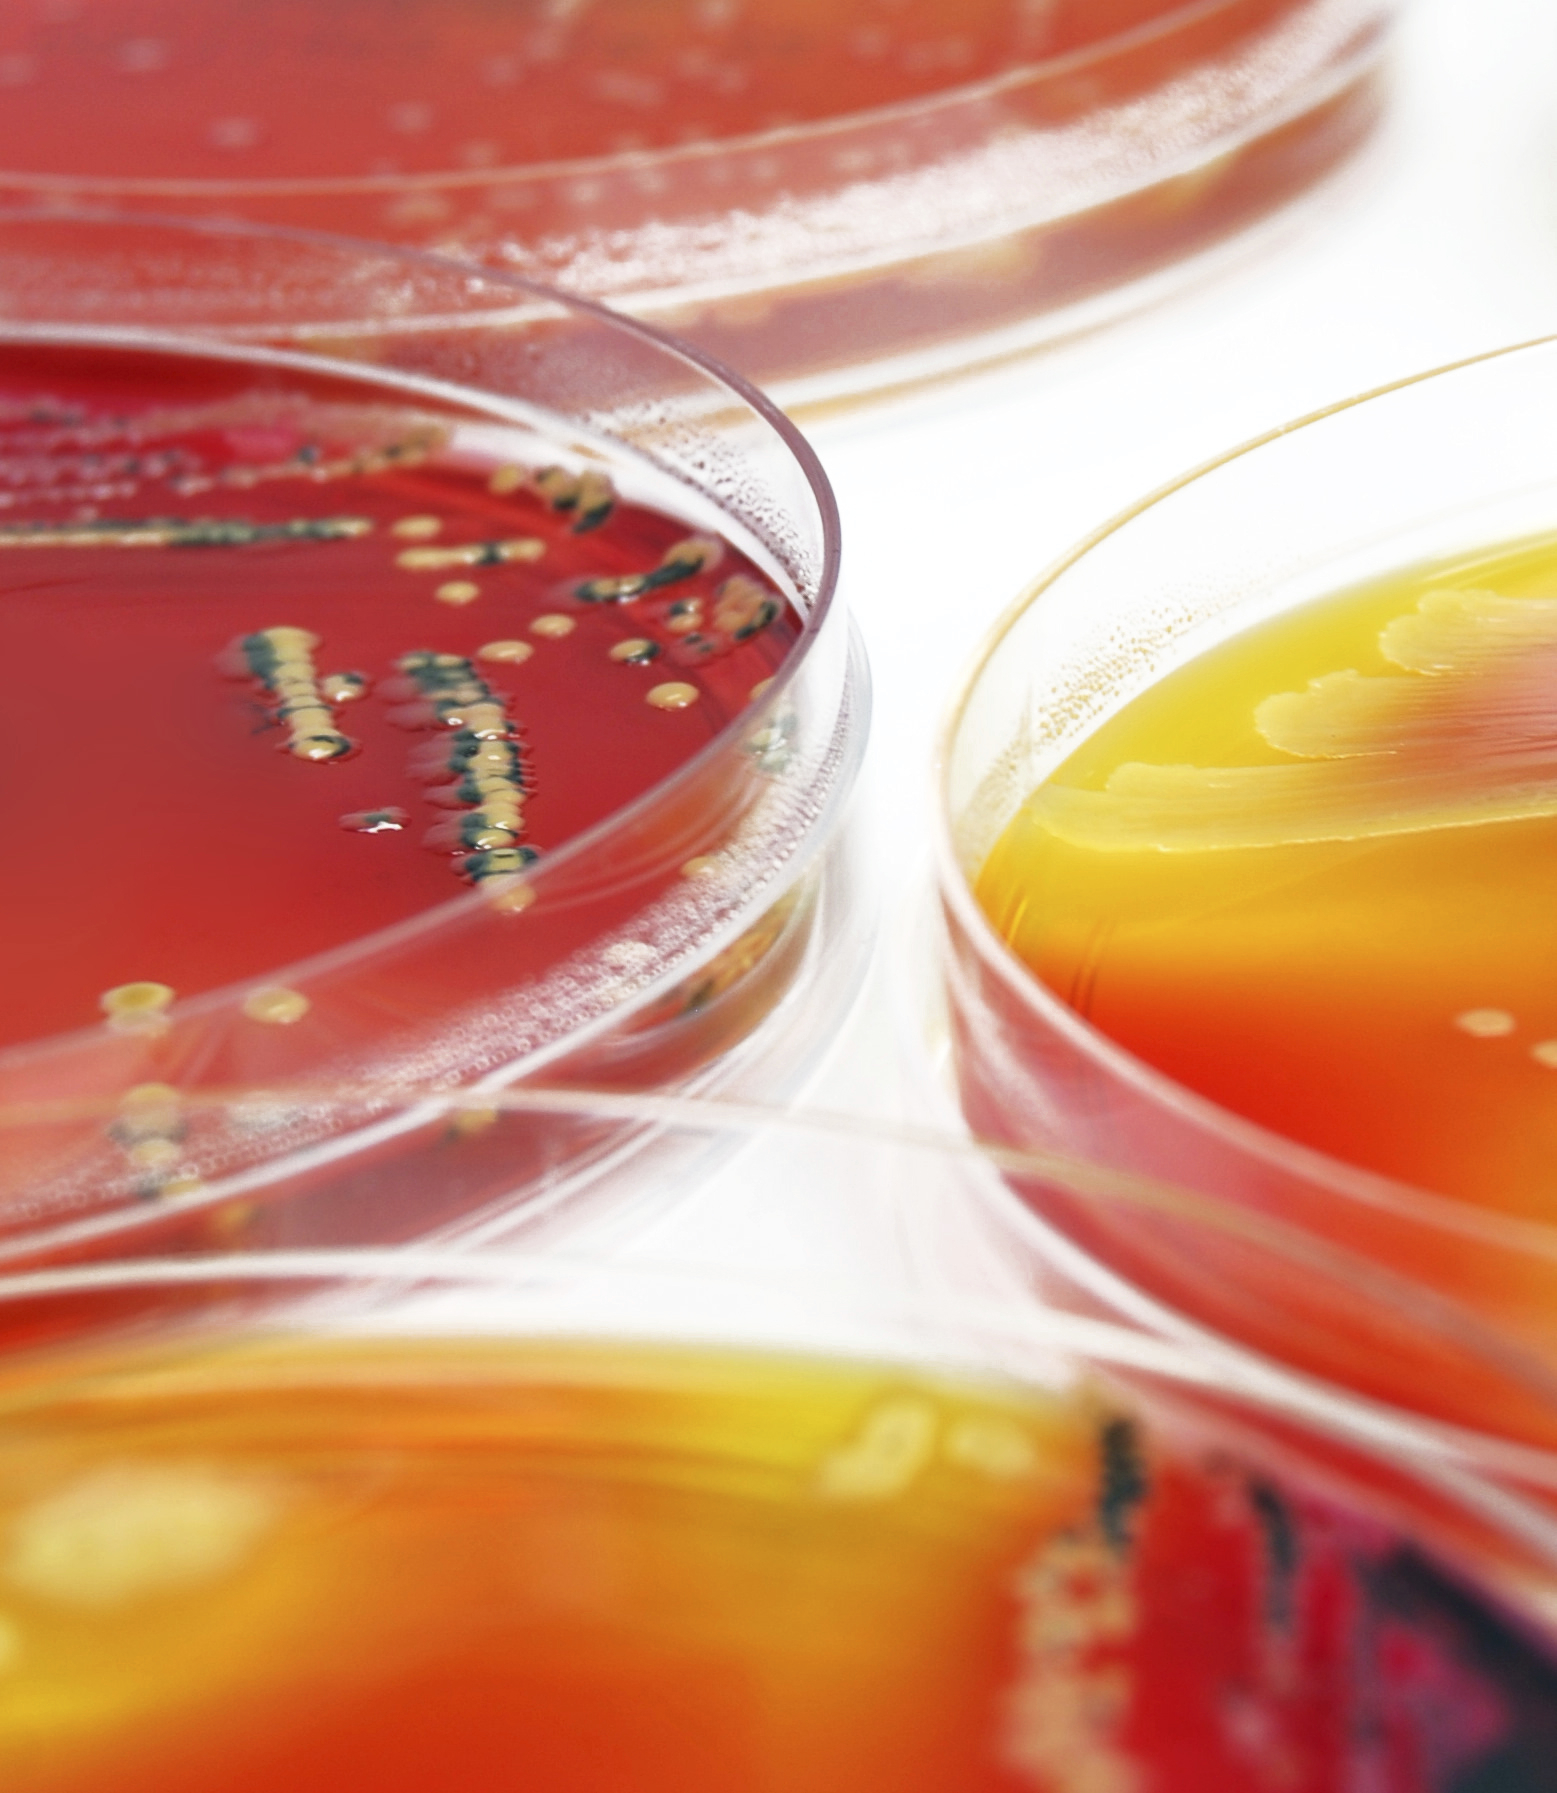 Bacterial characterization